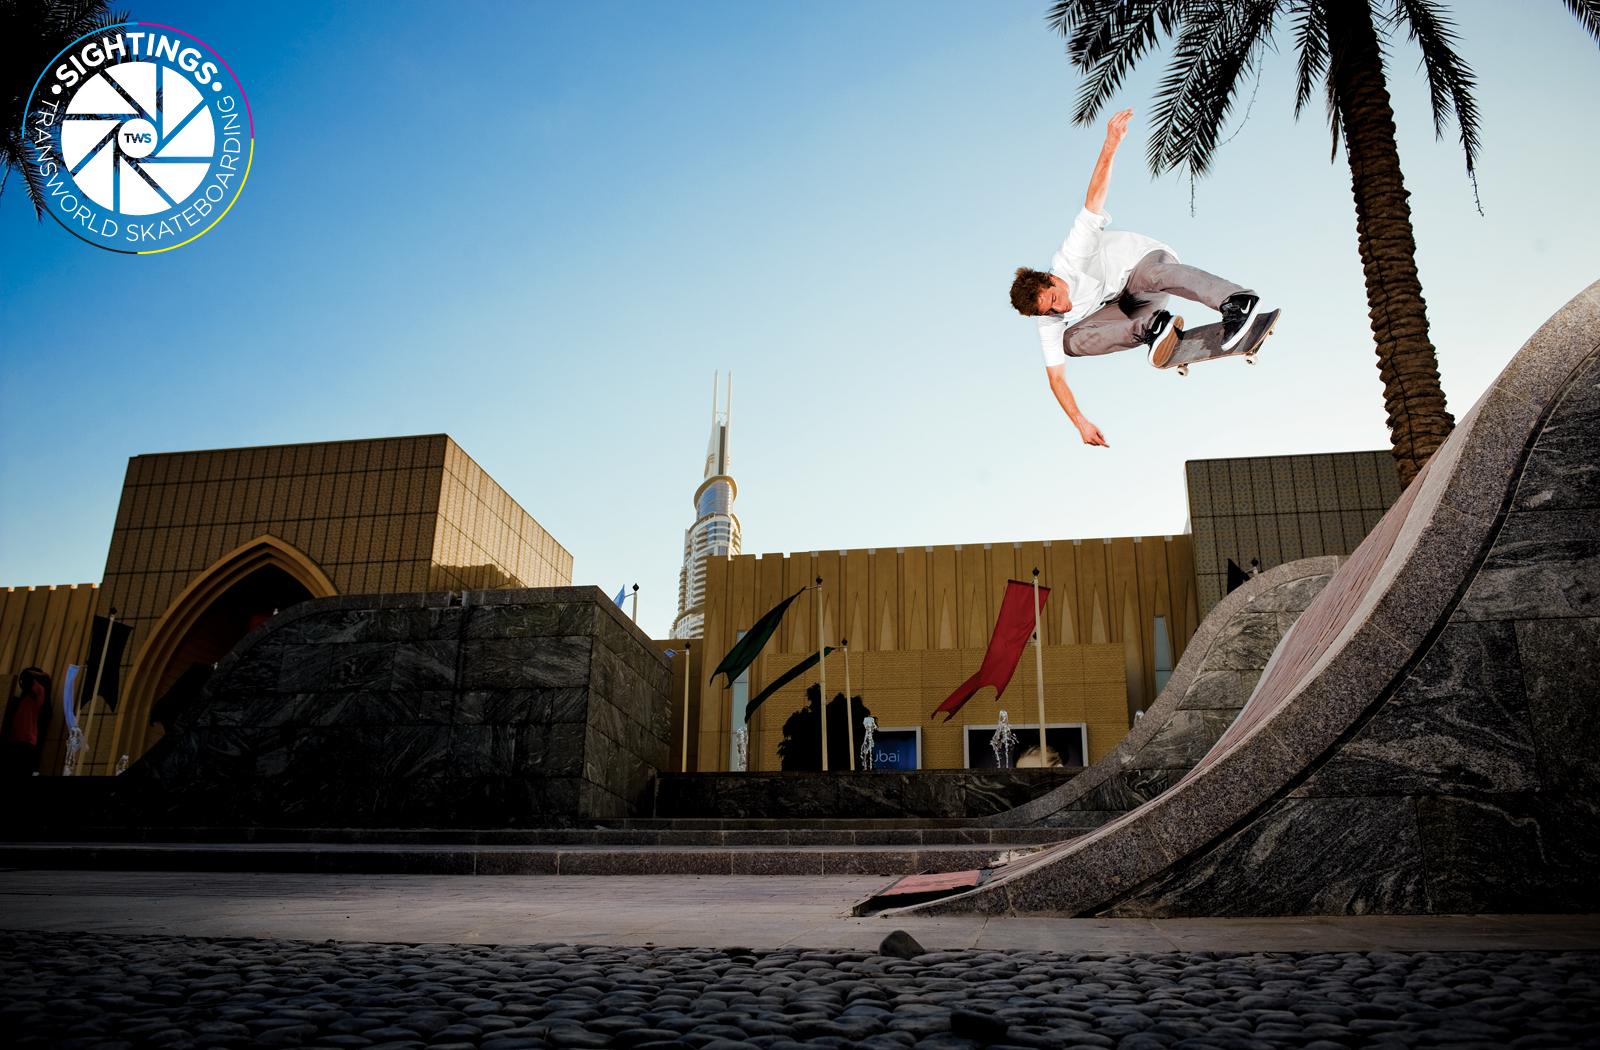 Transworld Skateboarding Wallpaper Wednesday wallpaper 1600x1050